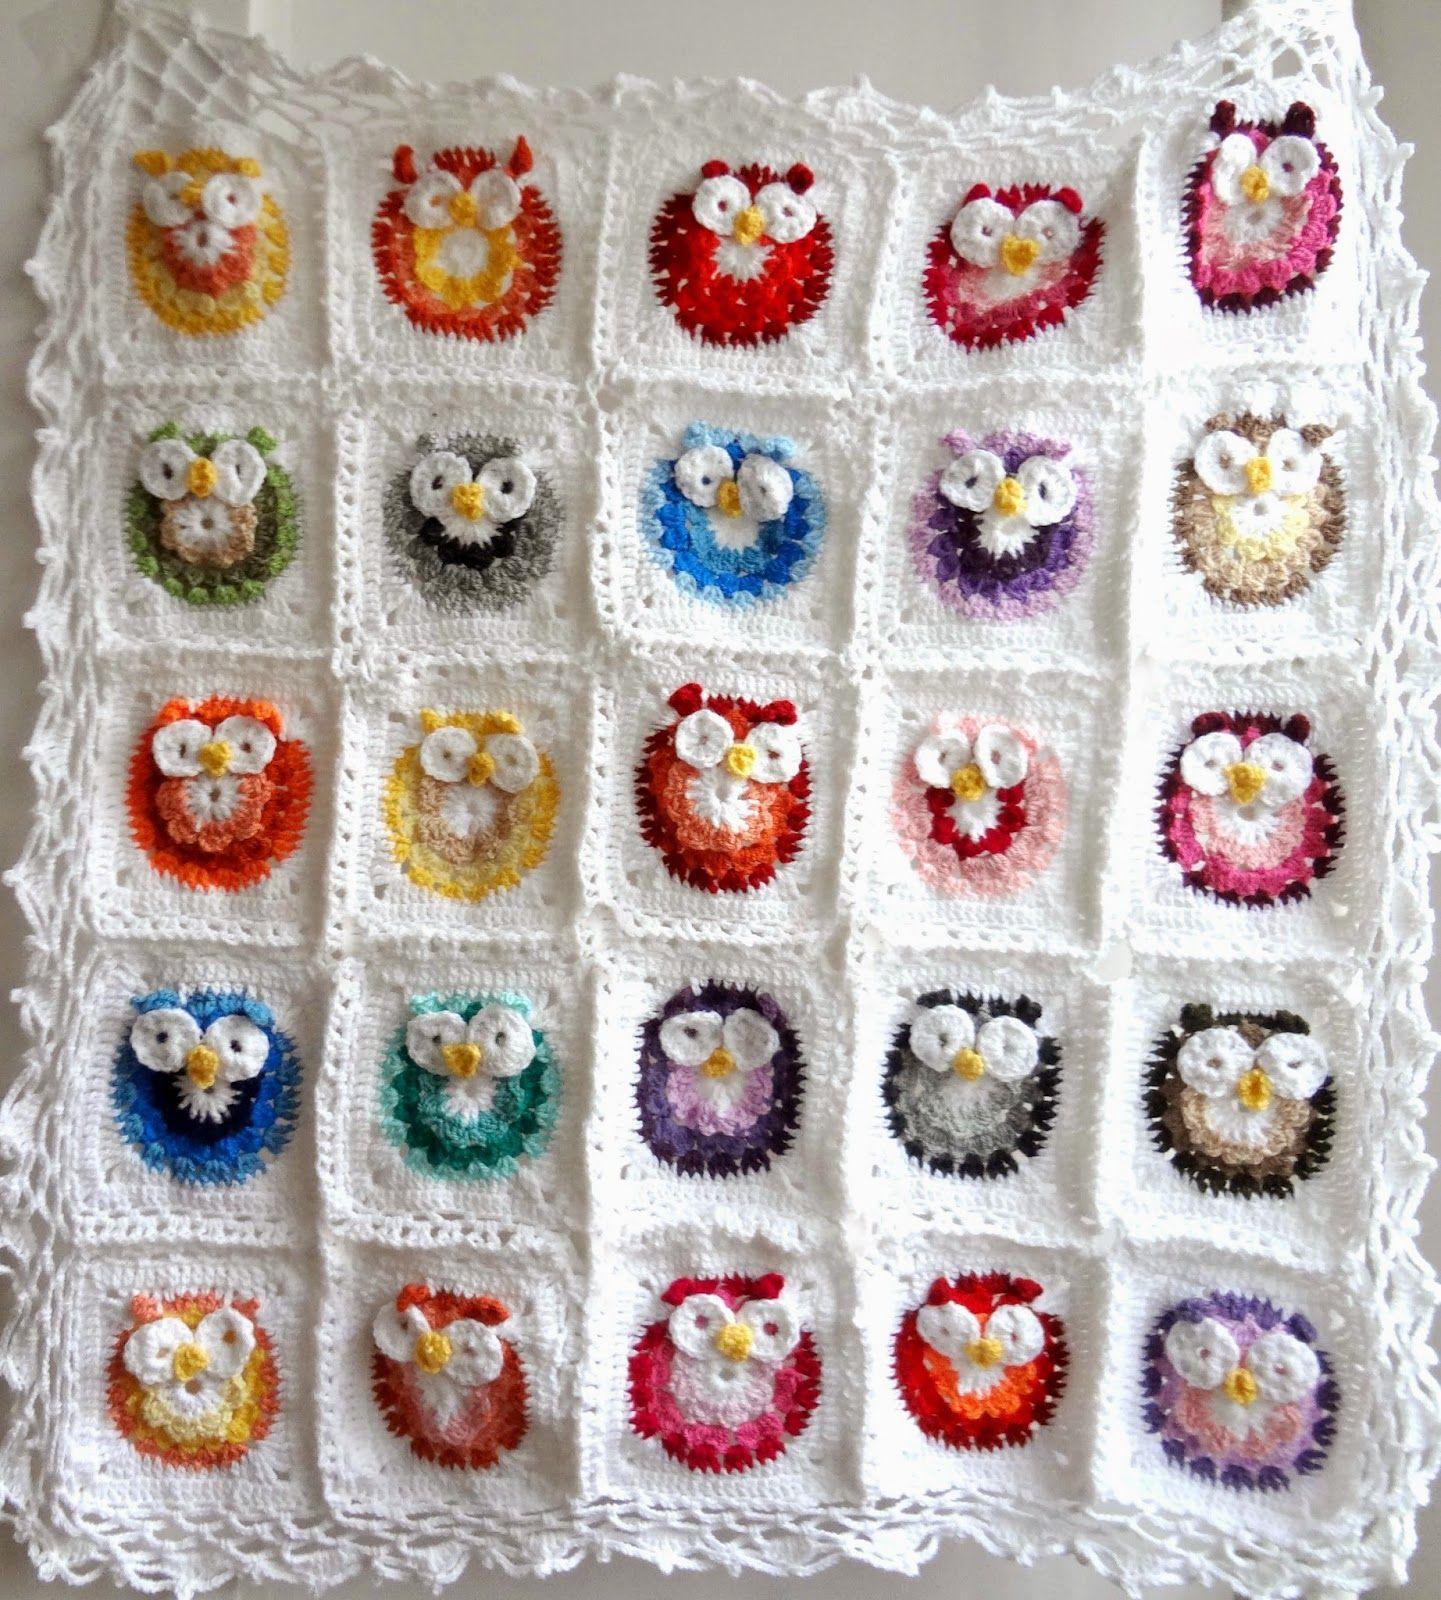 Owl blanket crochet pattern crochetholic hilariafina owl blanket crochet pattern bankloansurffo Image collections